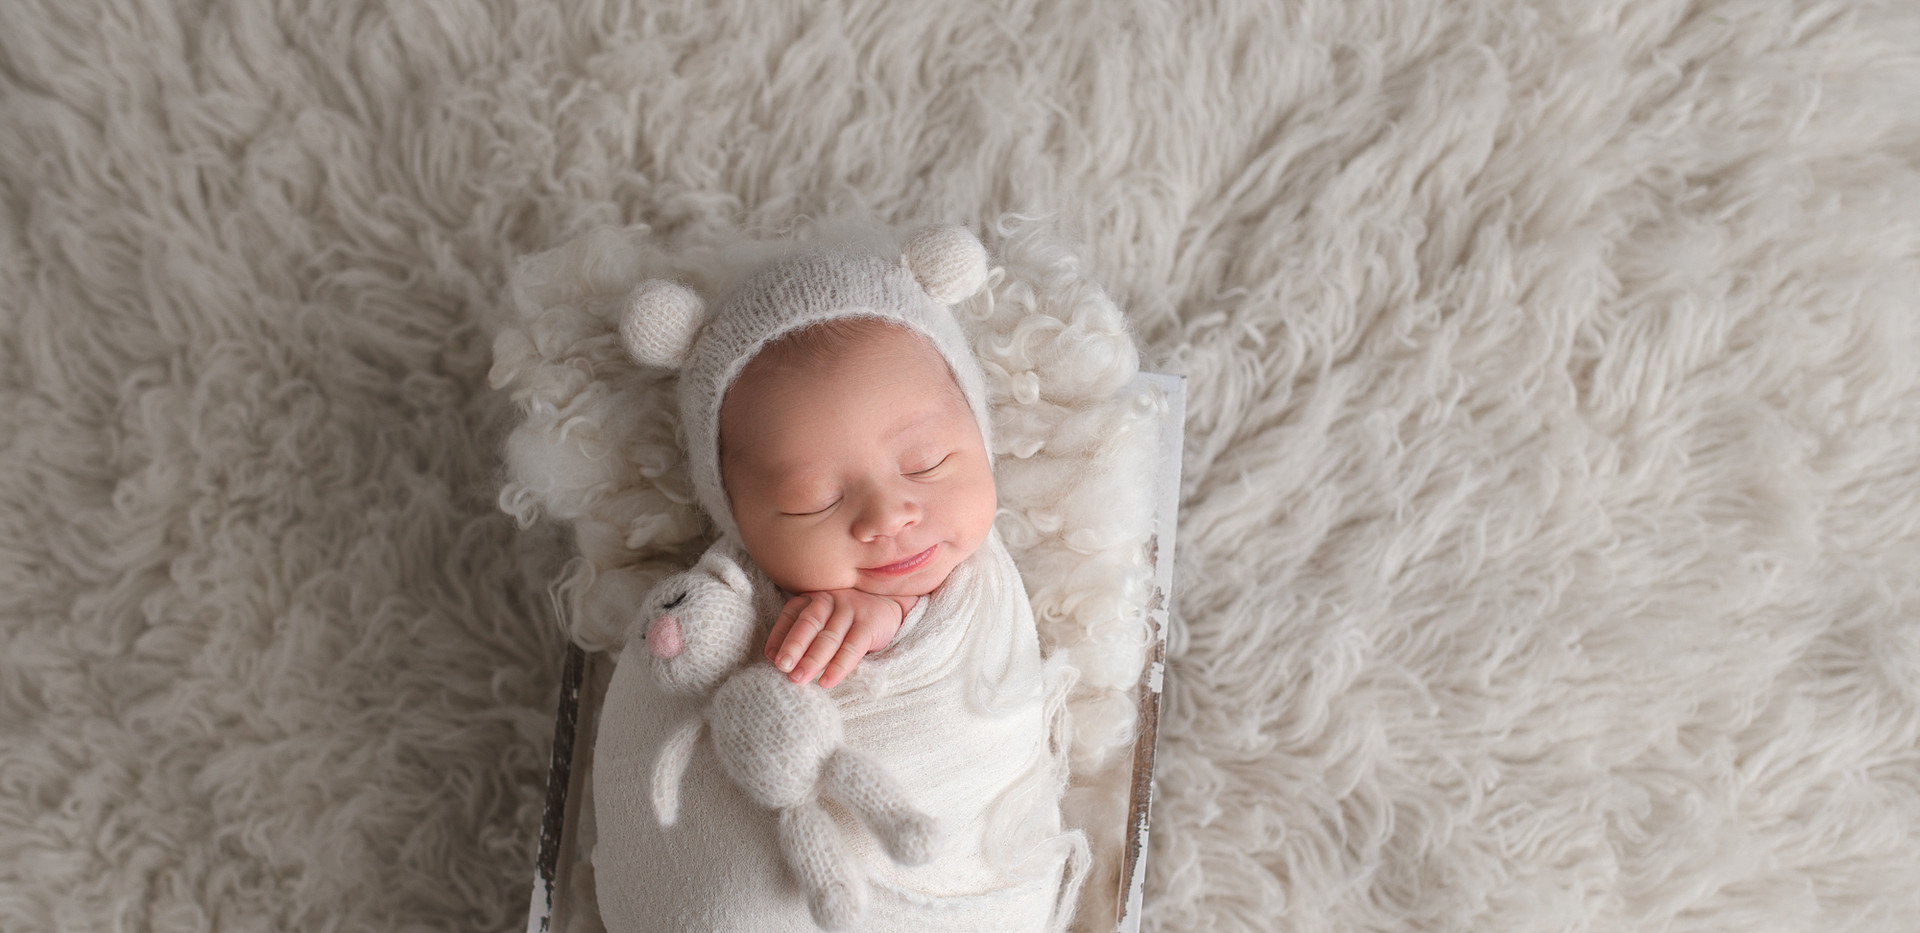 Canajoharie Newborn photos.jpg